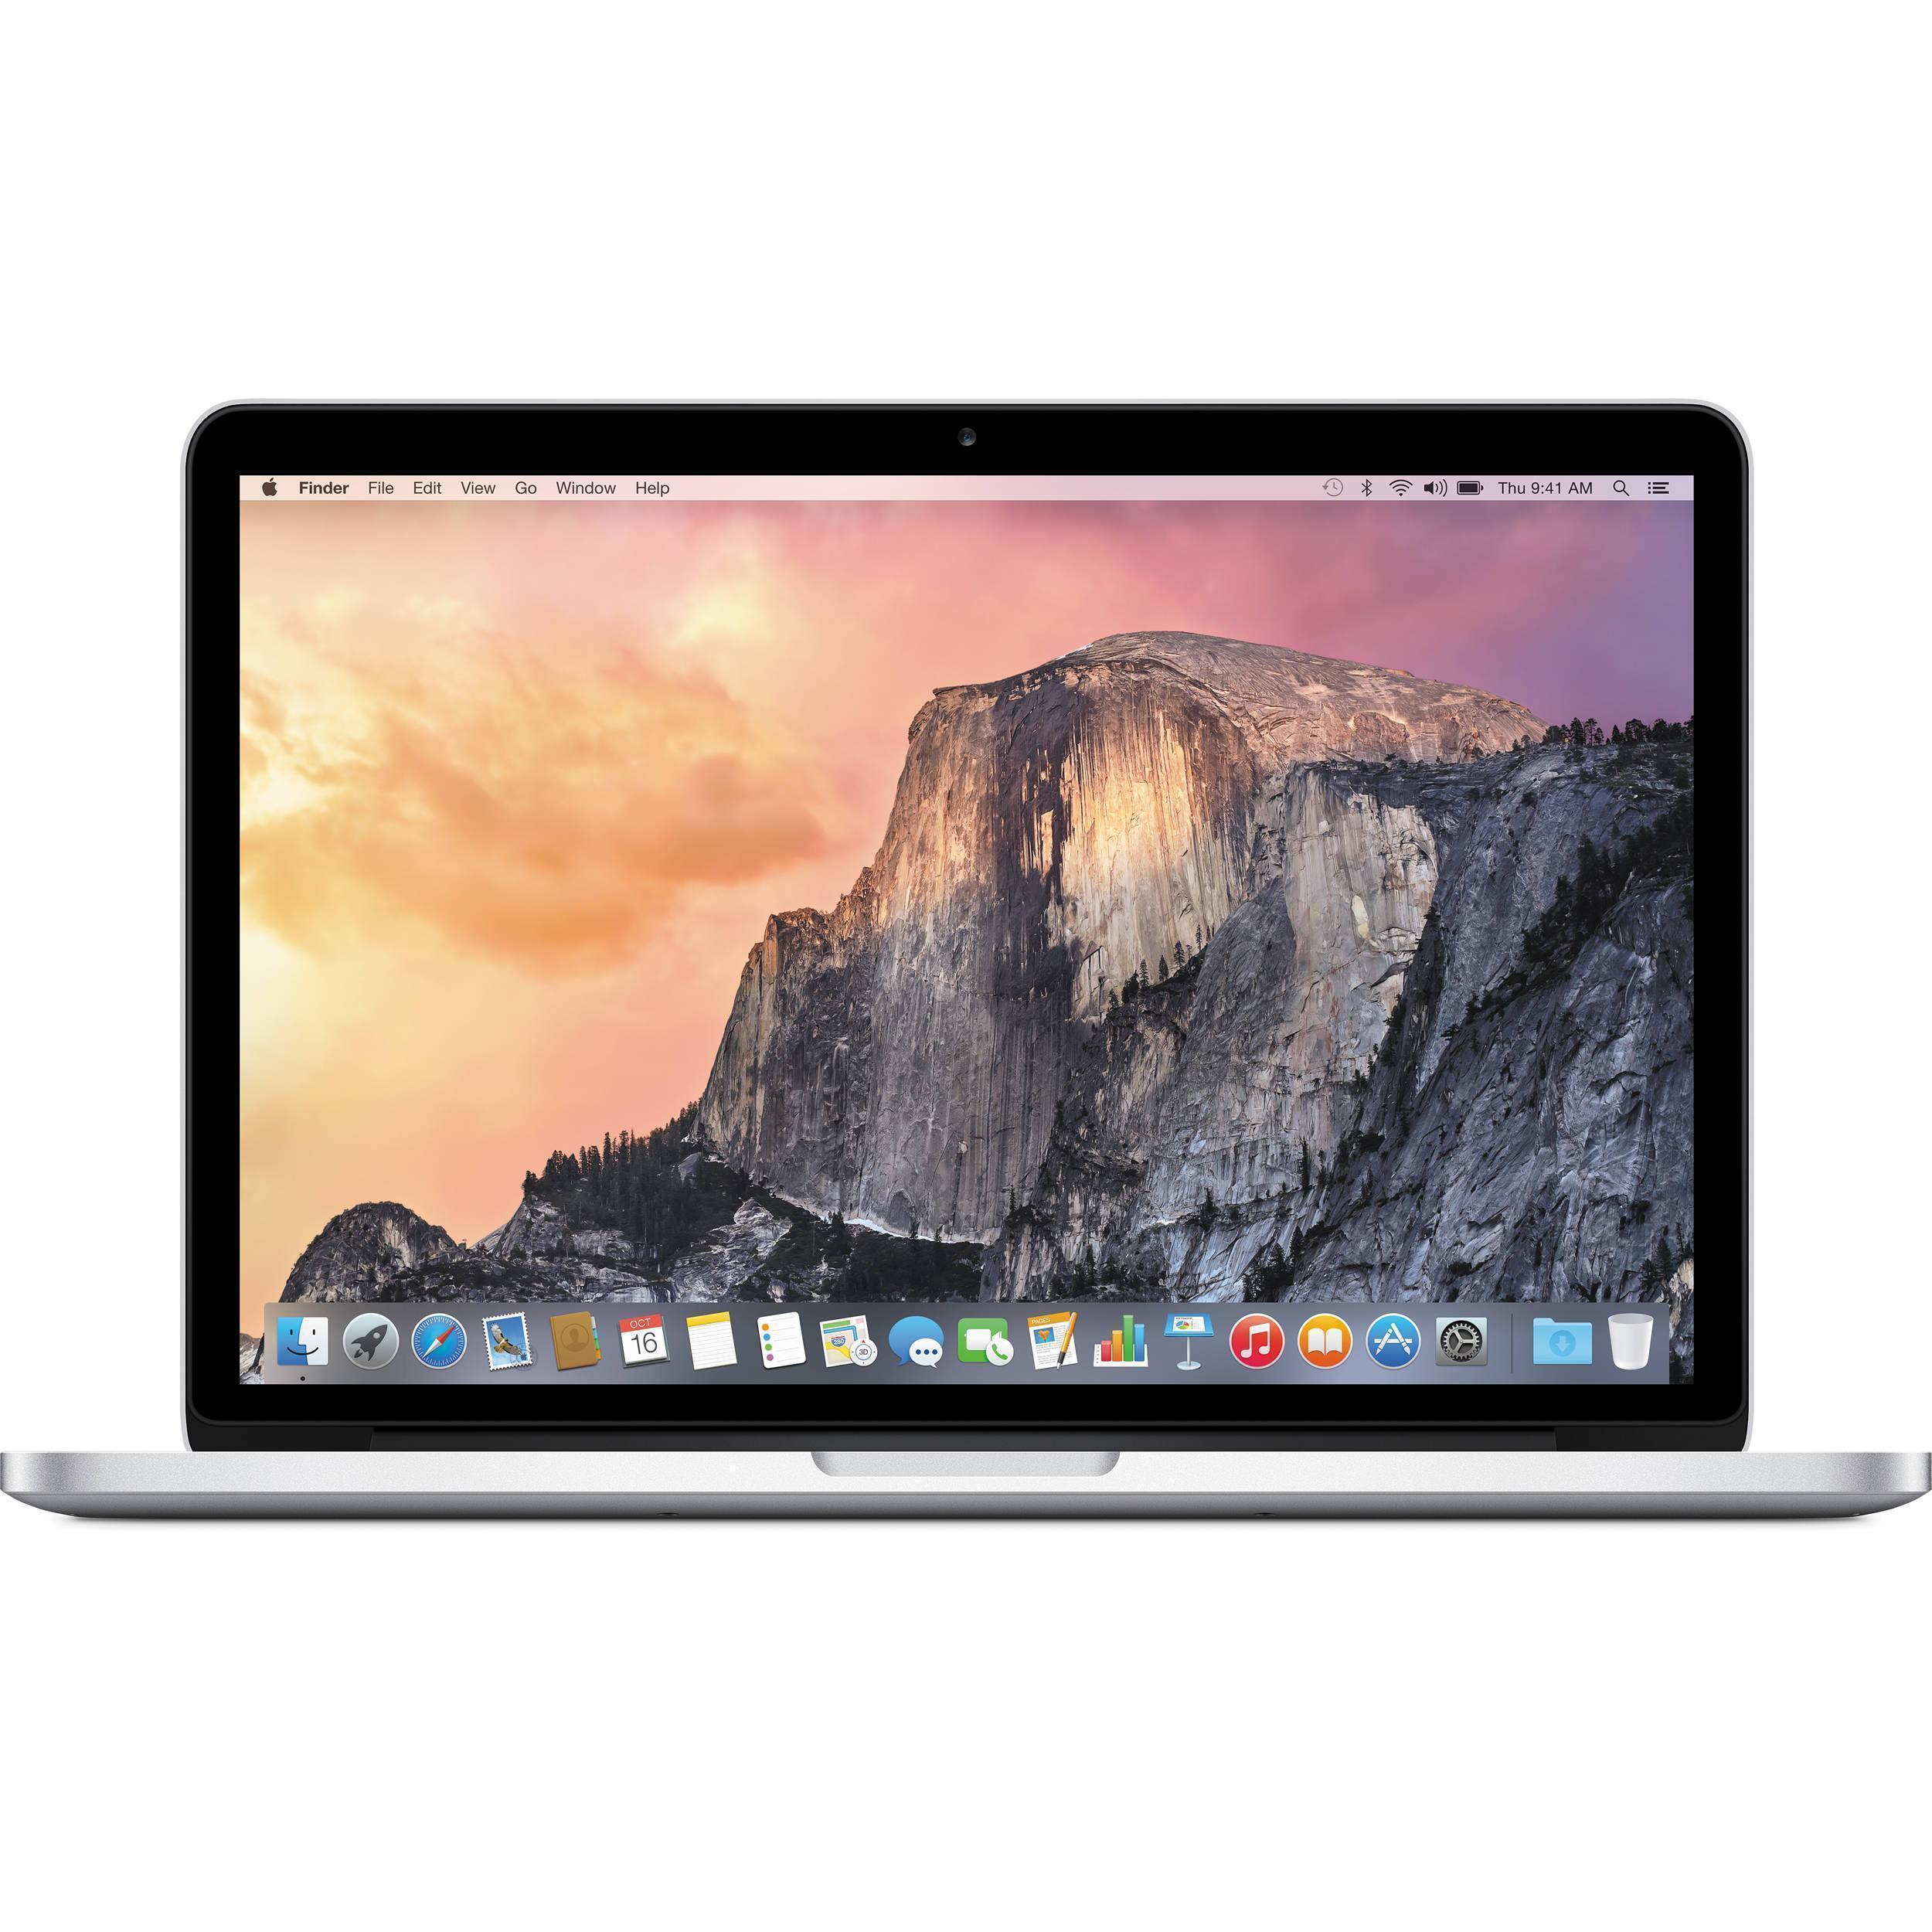 "MacBook Pro 13,3"" (2014) - Core i5 - 8GB - SSD 256 GB QWERTY - Anglická (US)"